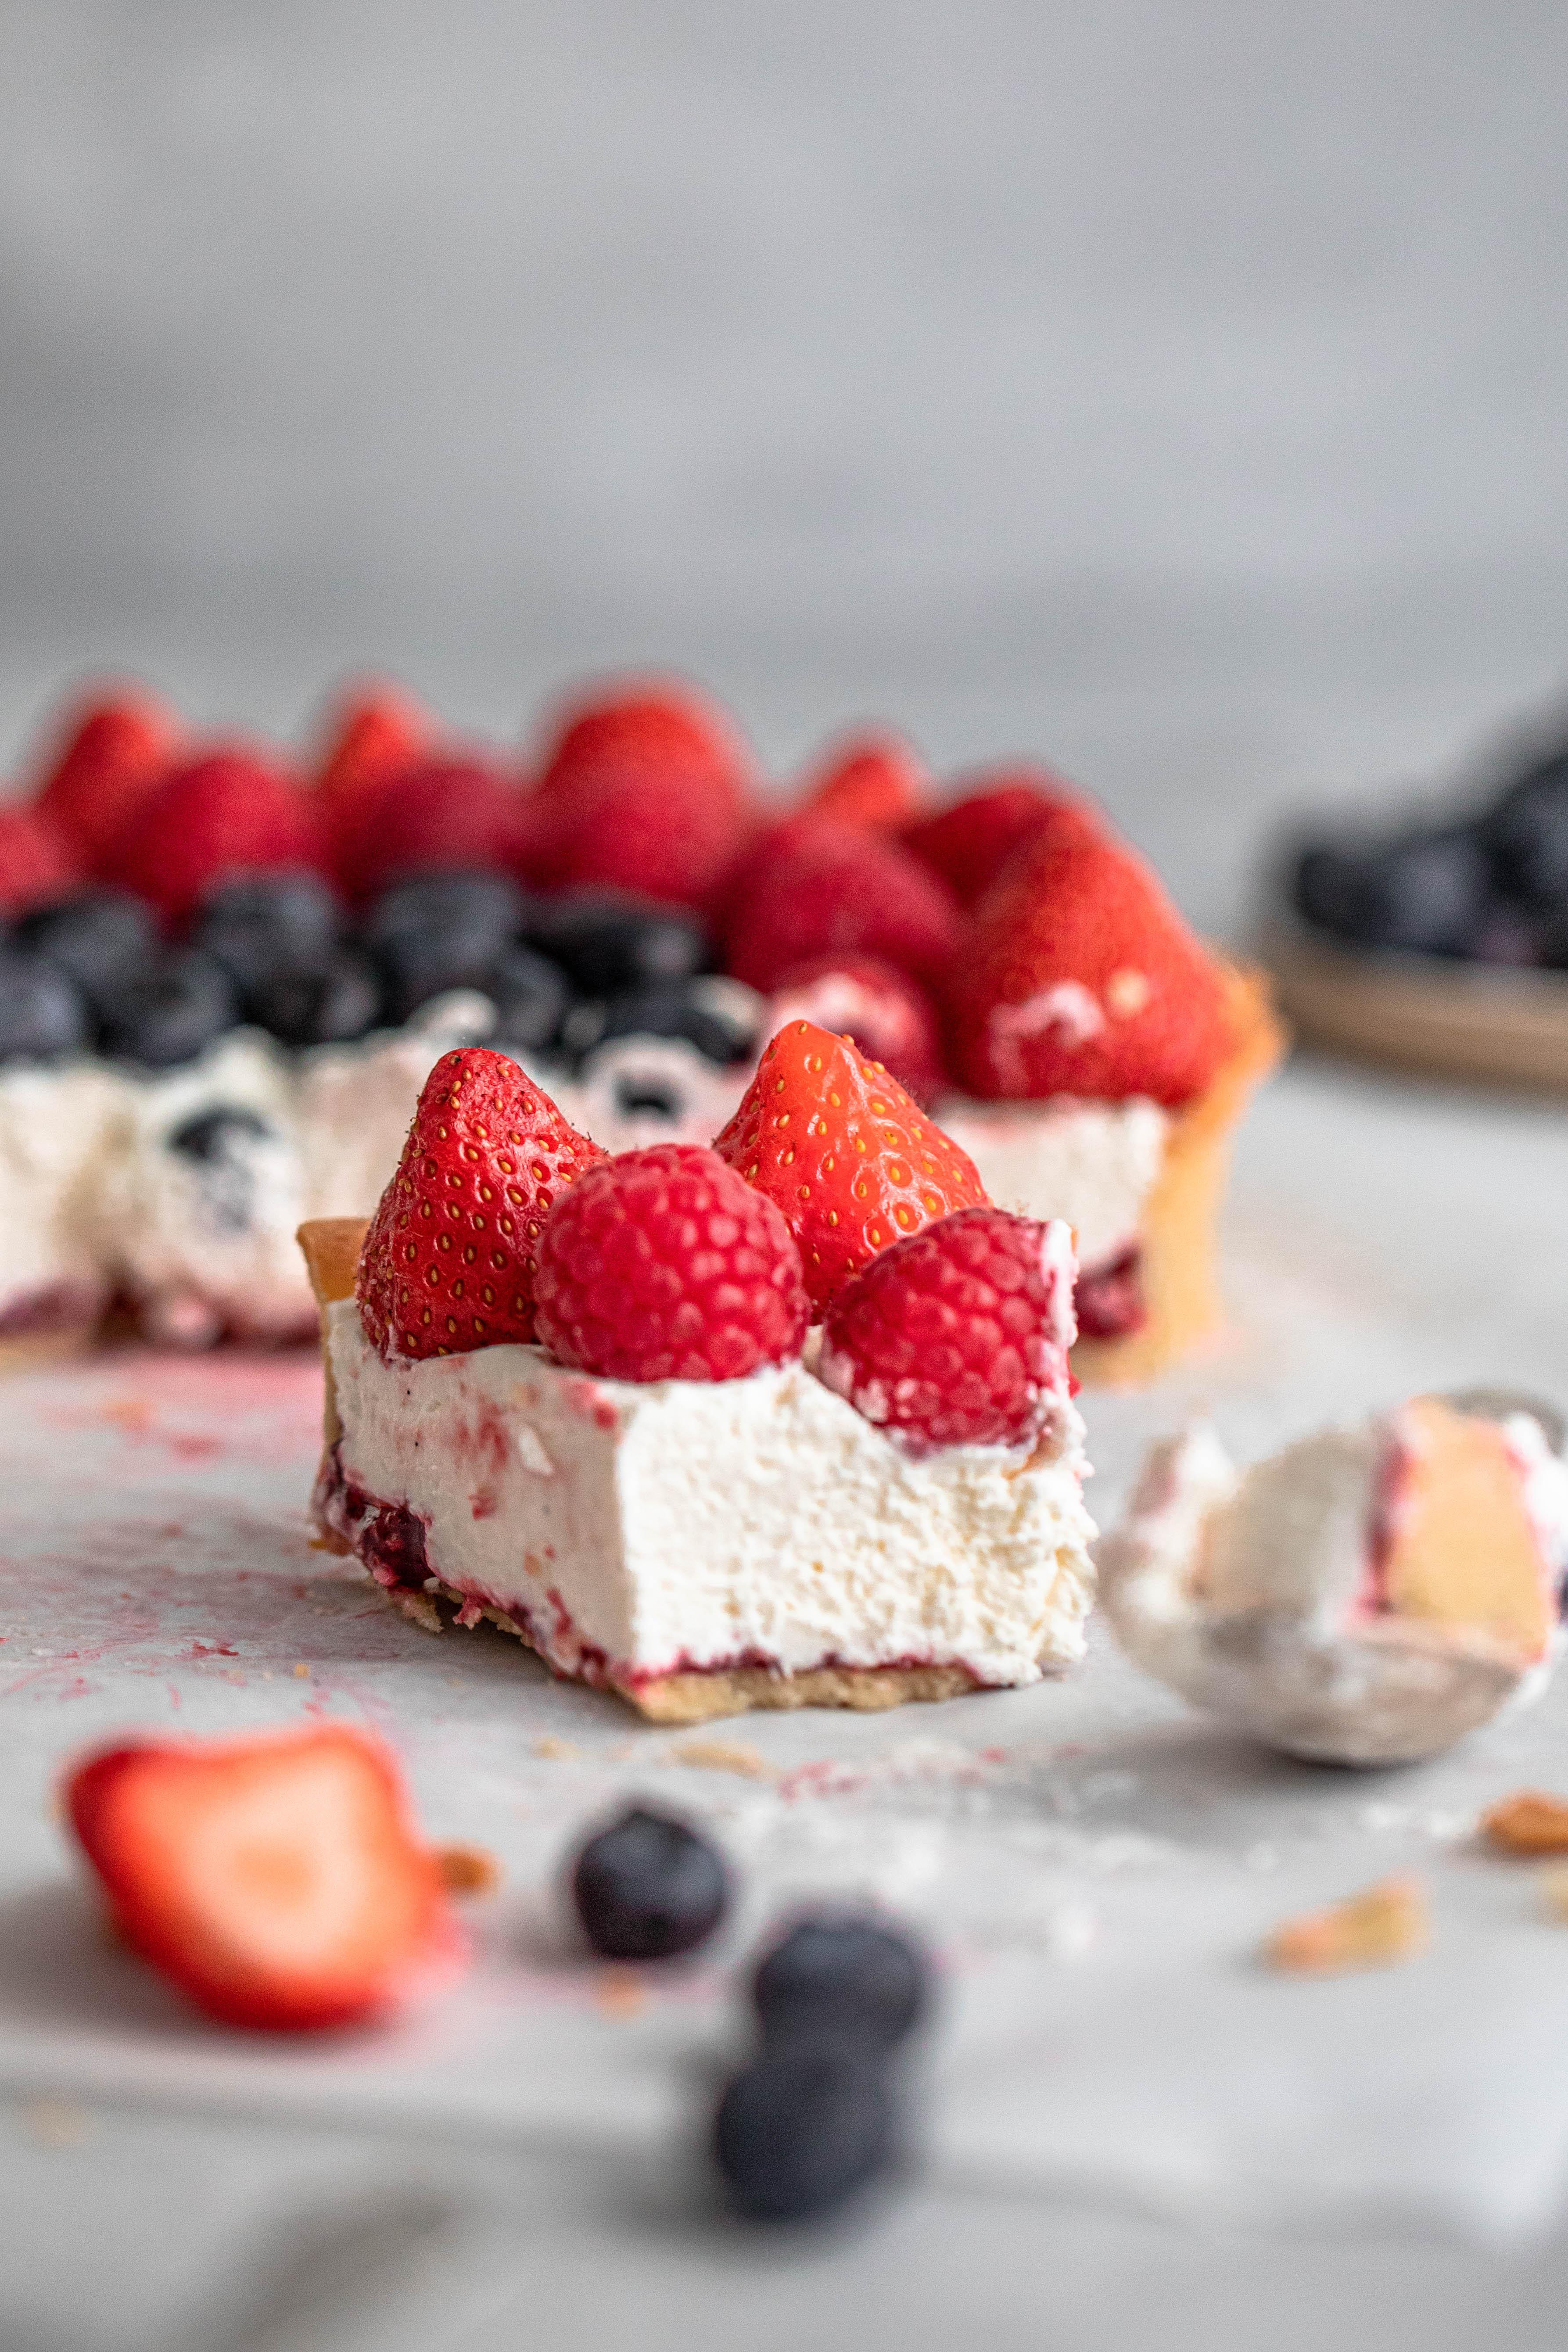 Closeup shot of one berry tart slice